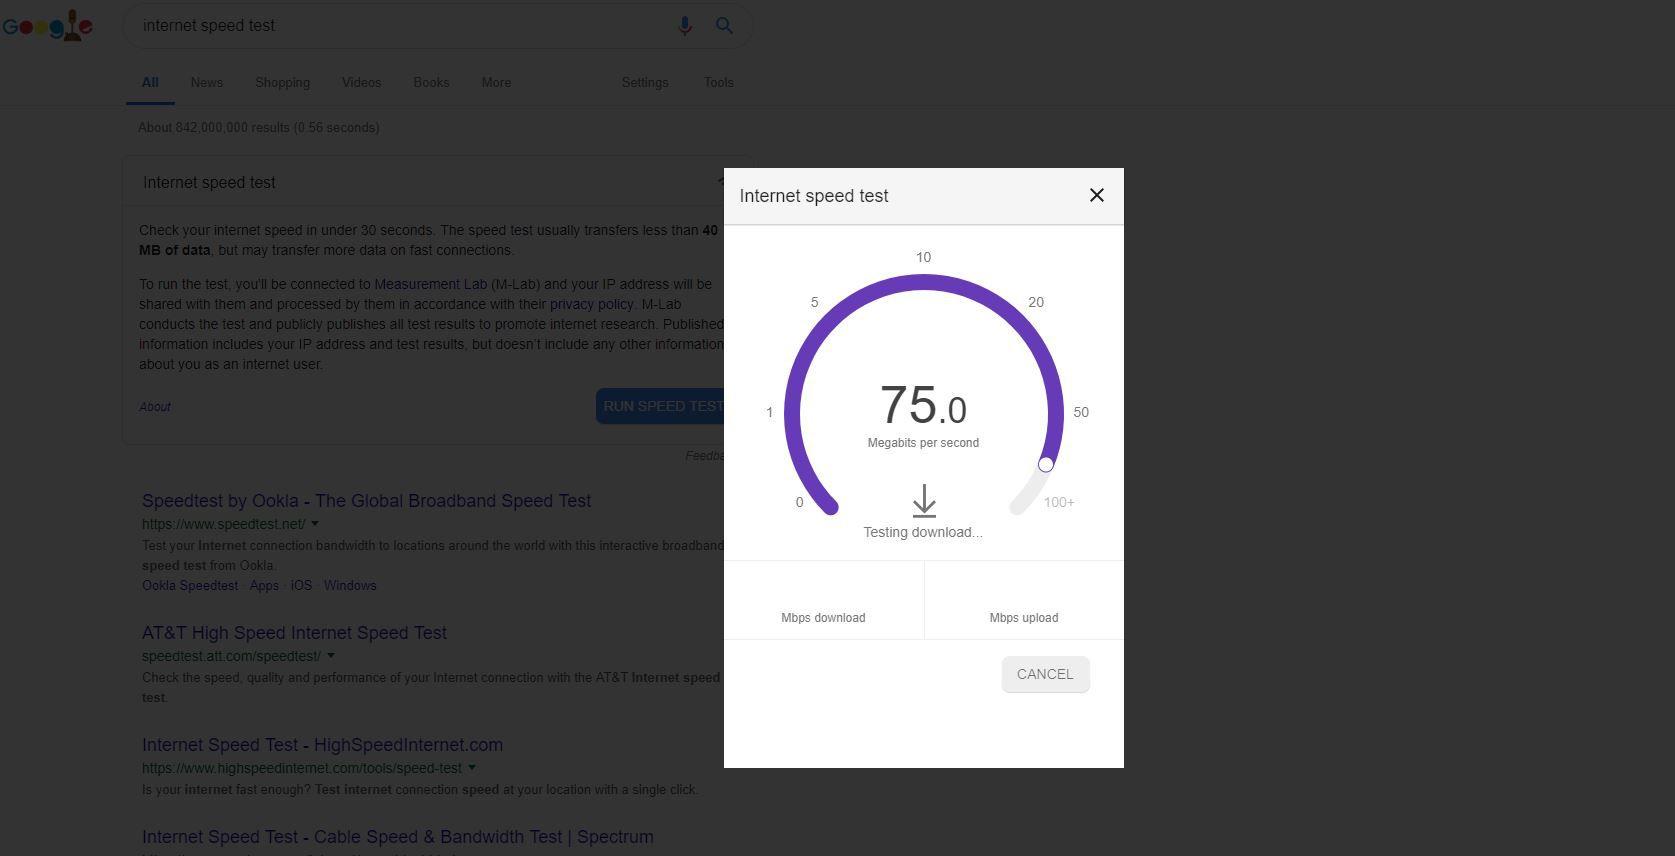 Screenshot of Internet speed test